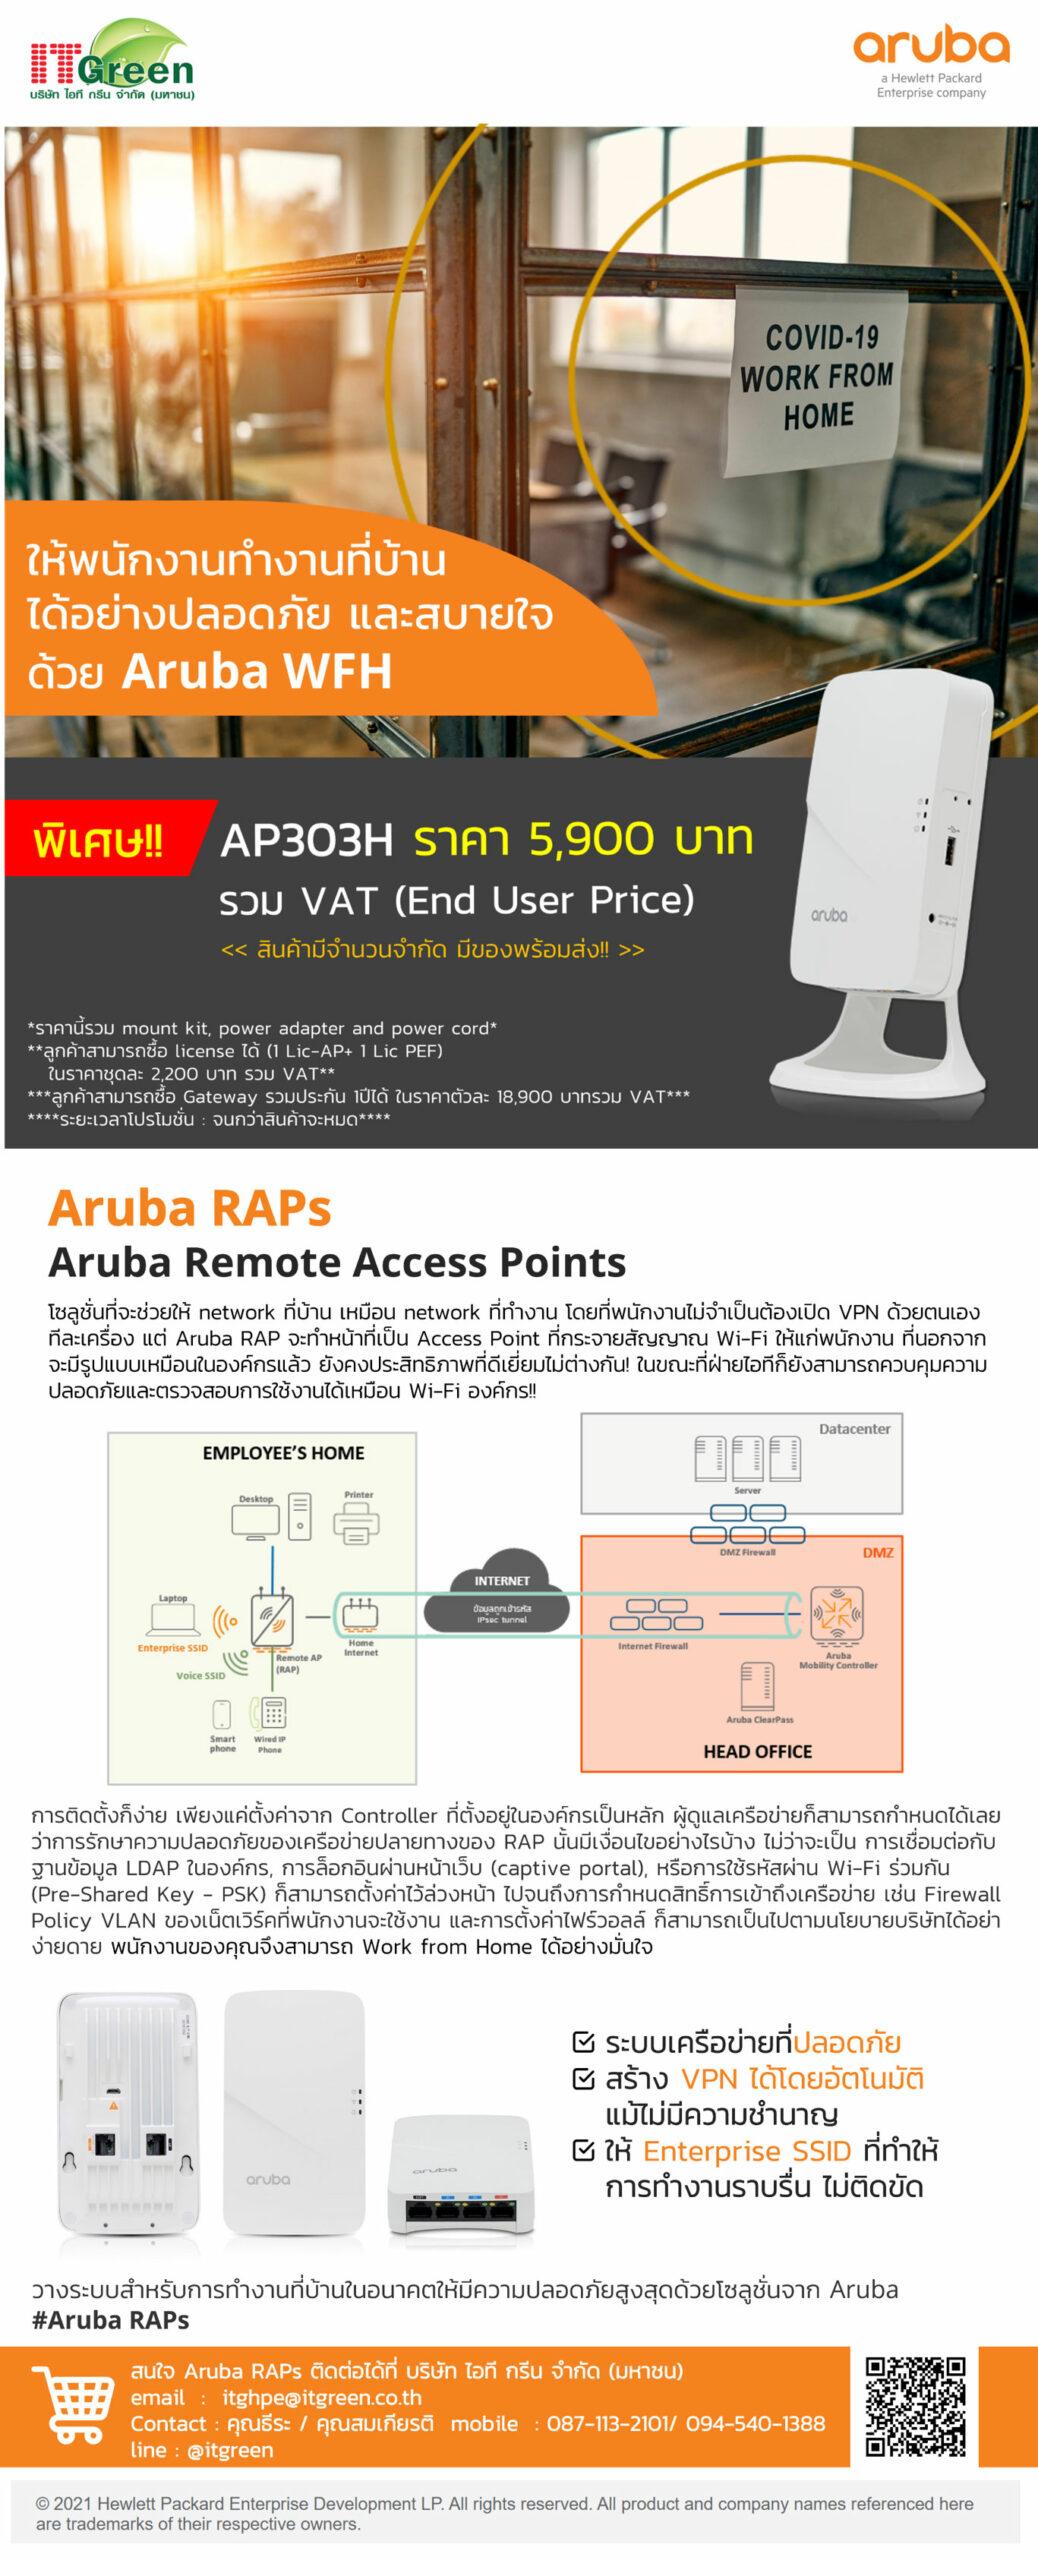 Aruba RAPs Promotion